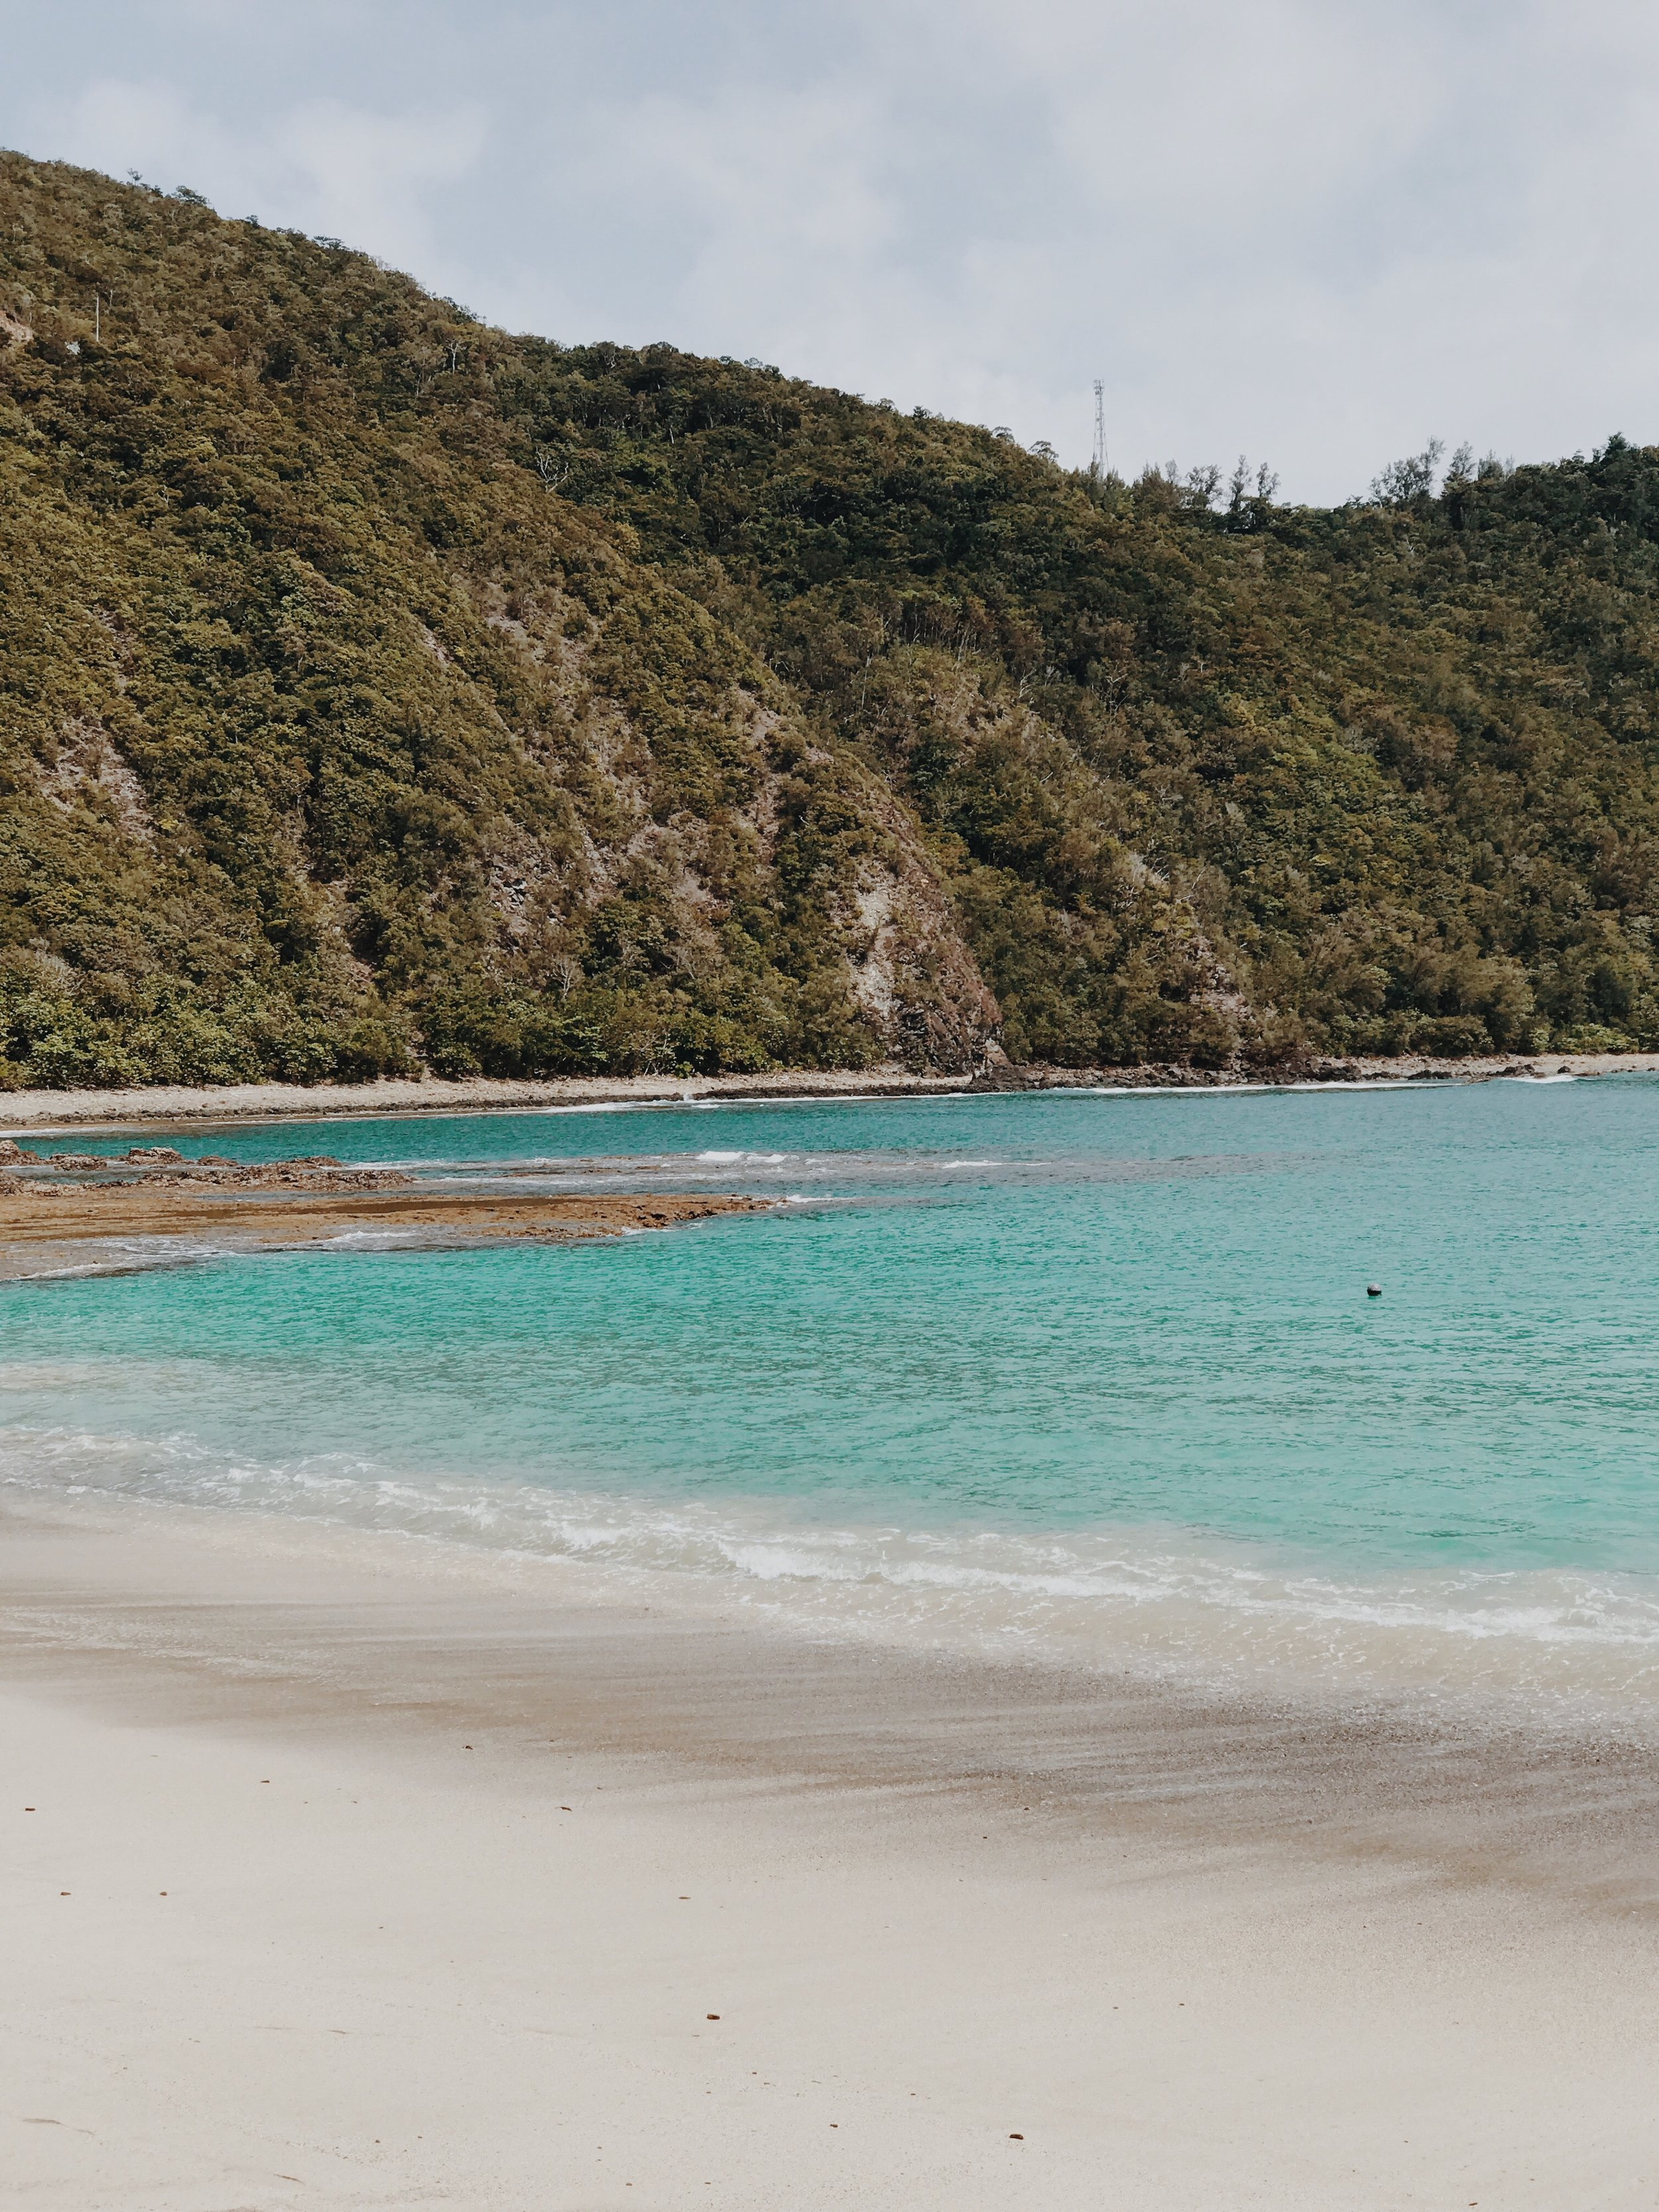 Beach in Baler, The Philippines